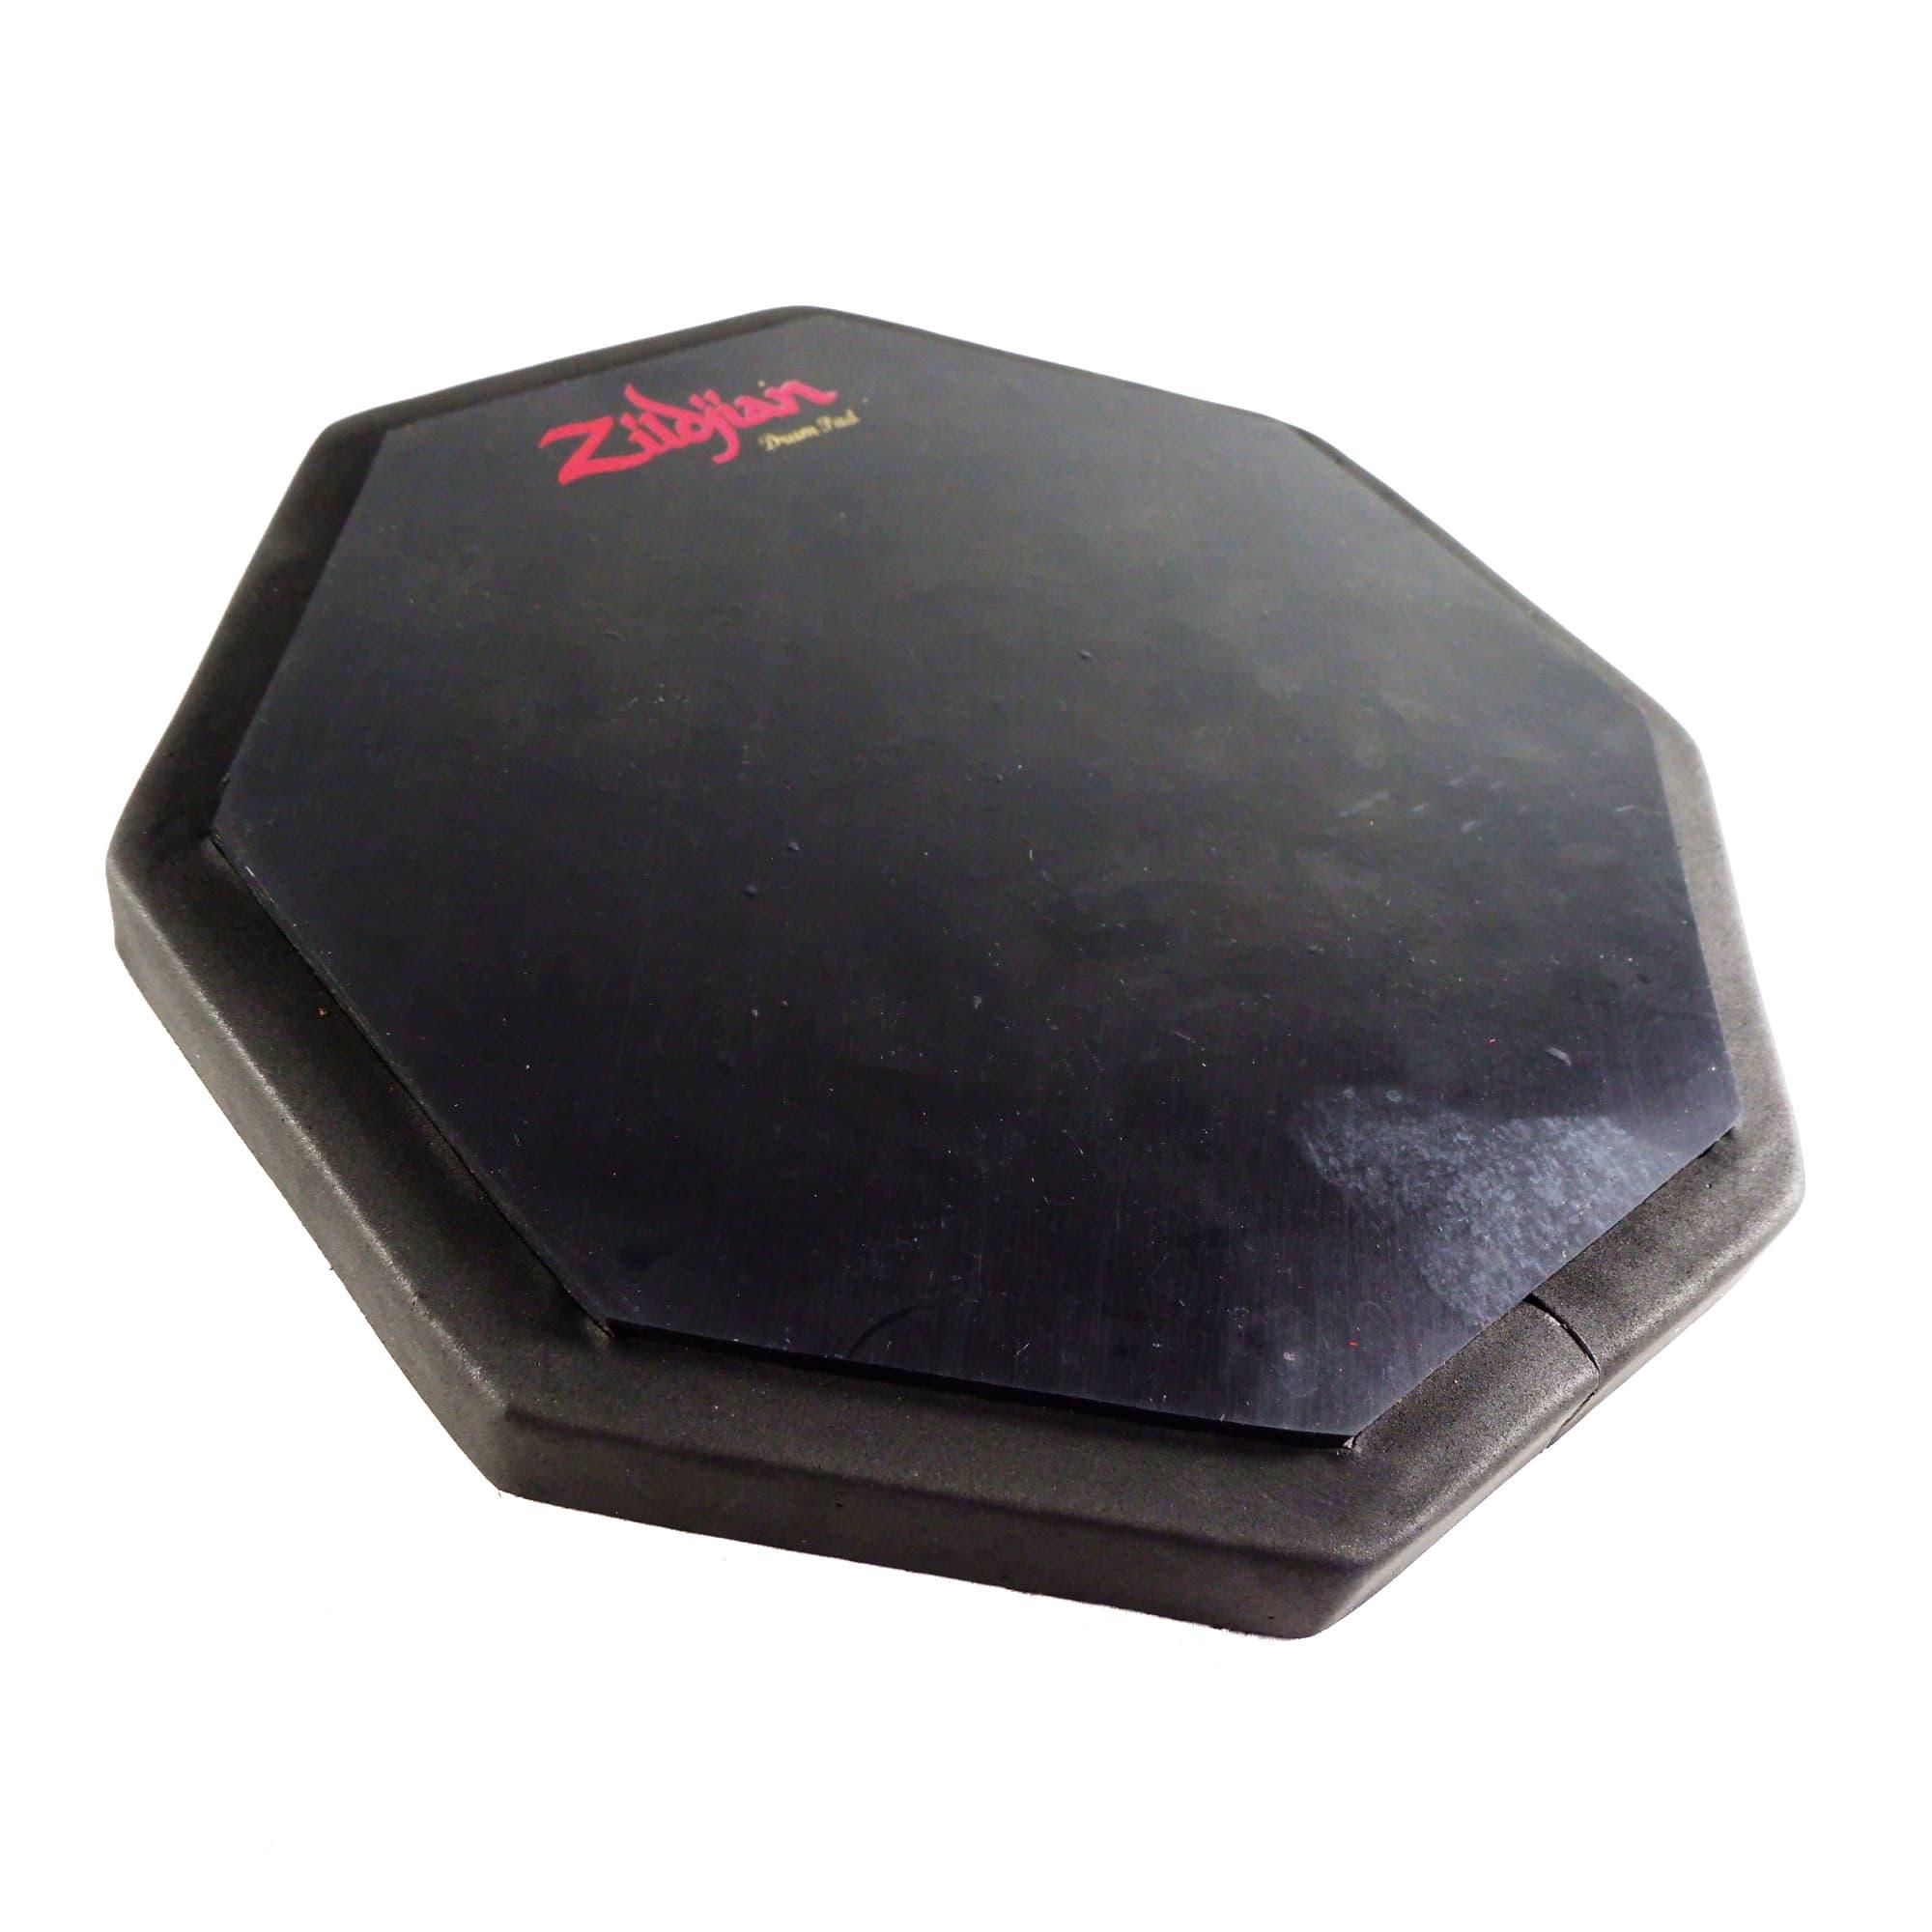 harga Drum Pad Zildjian 10 Inch Sticking Blanja.com